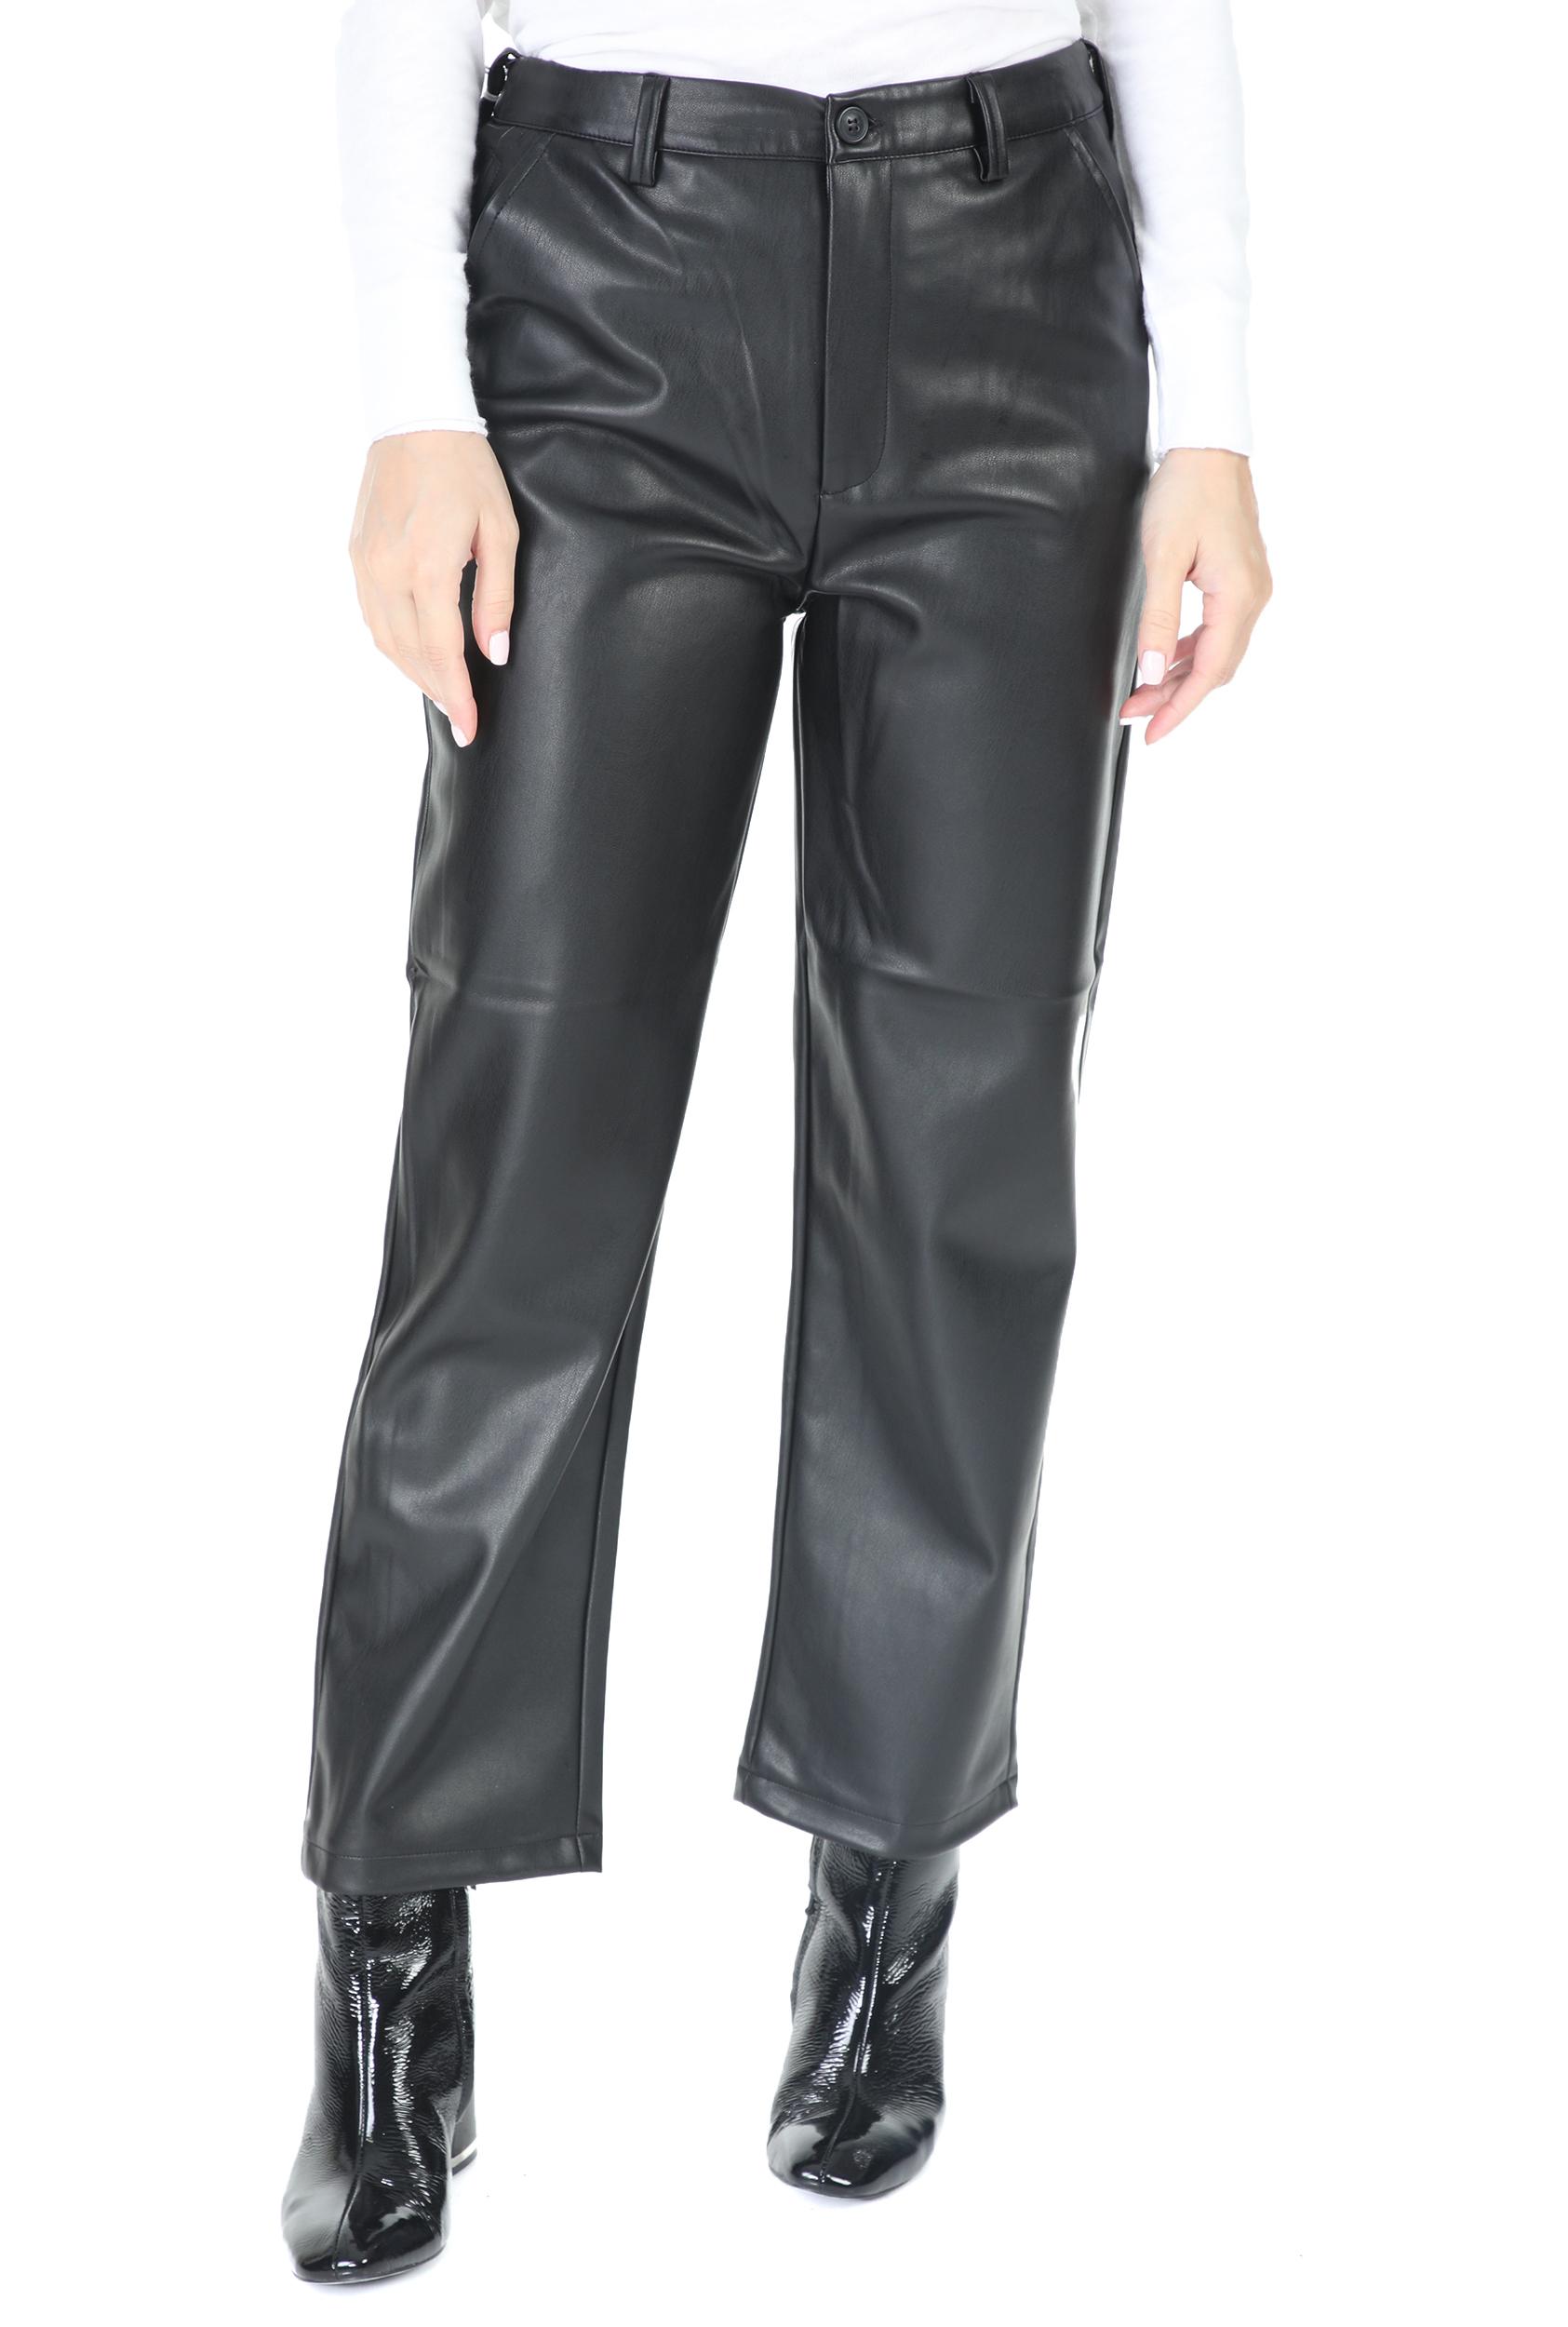 REIKO - Γυναικείο παντελόνι REIKO μαύρο